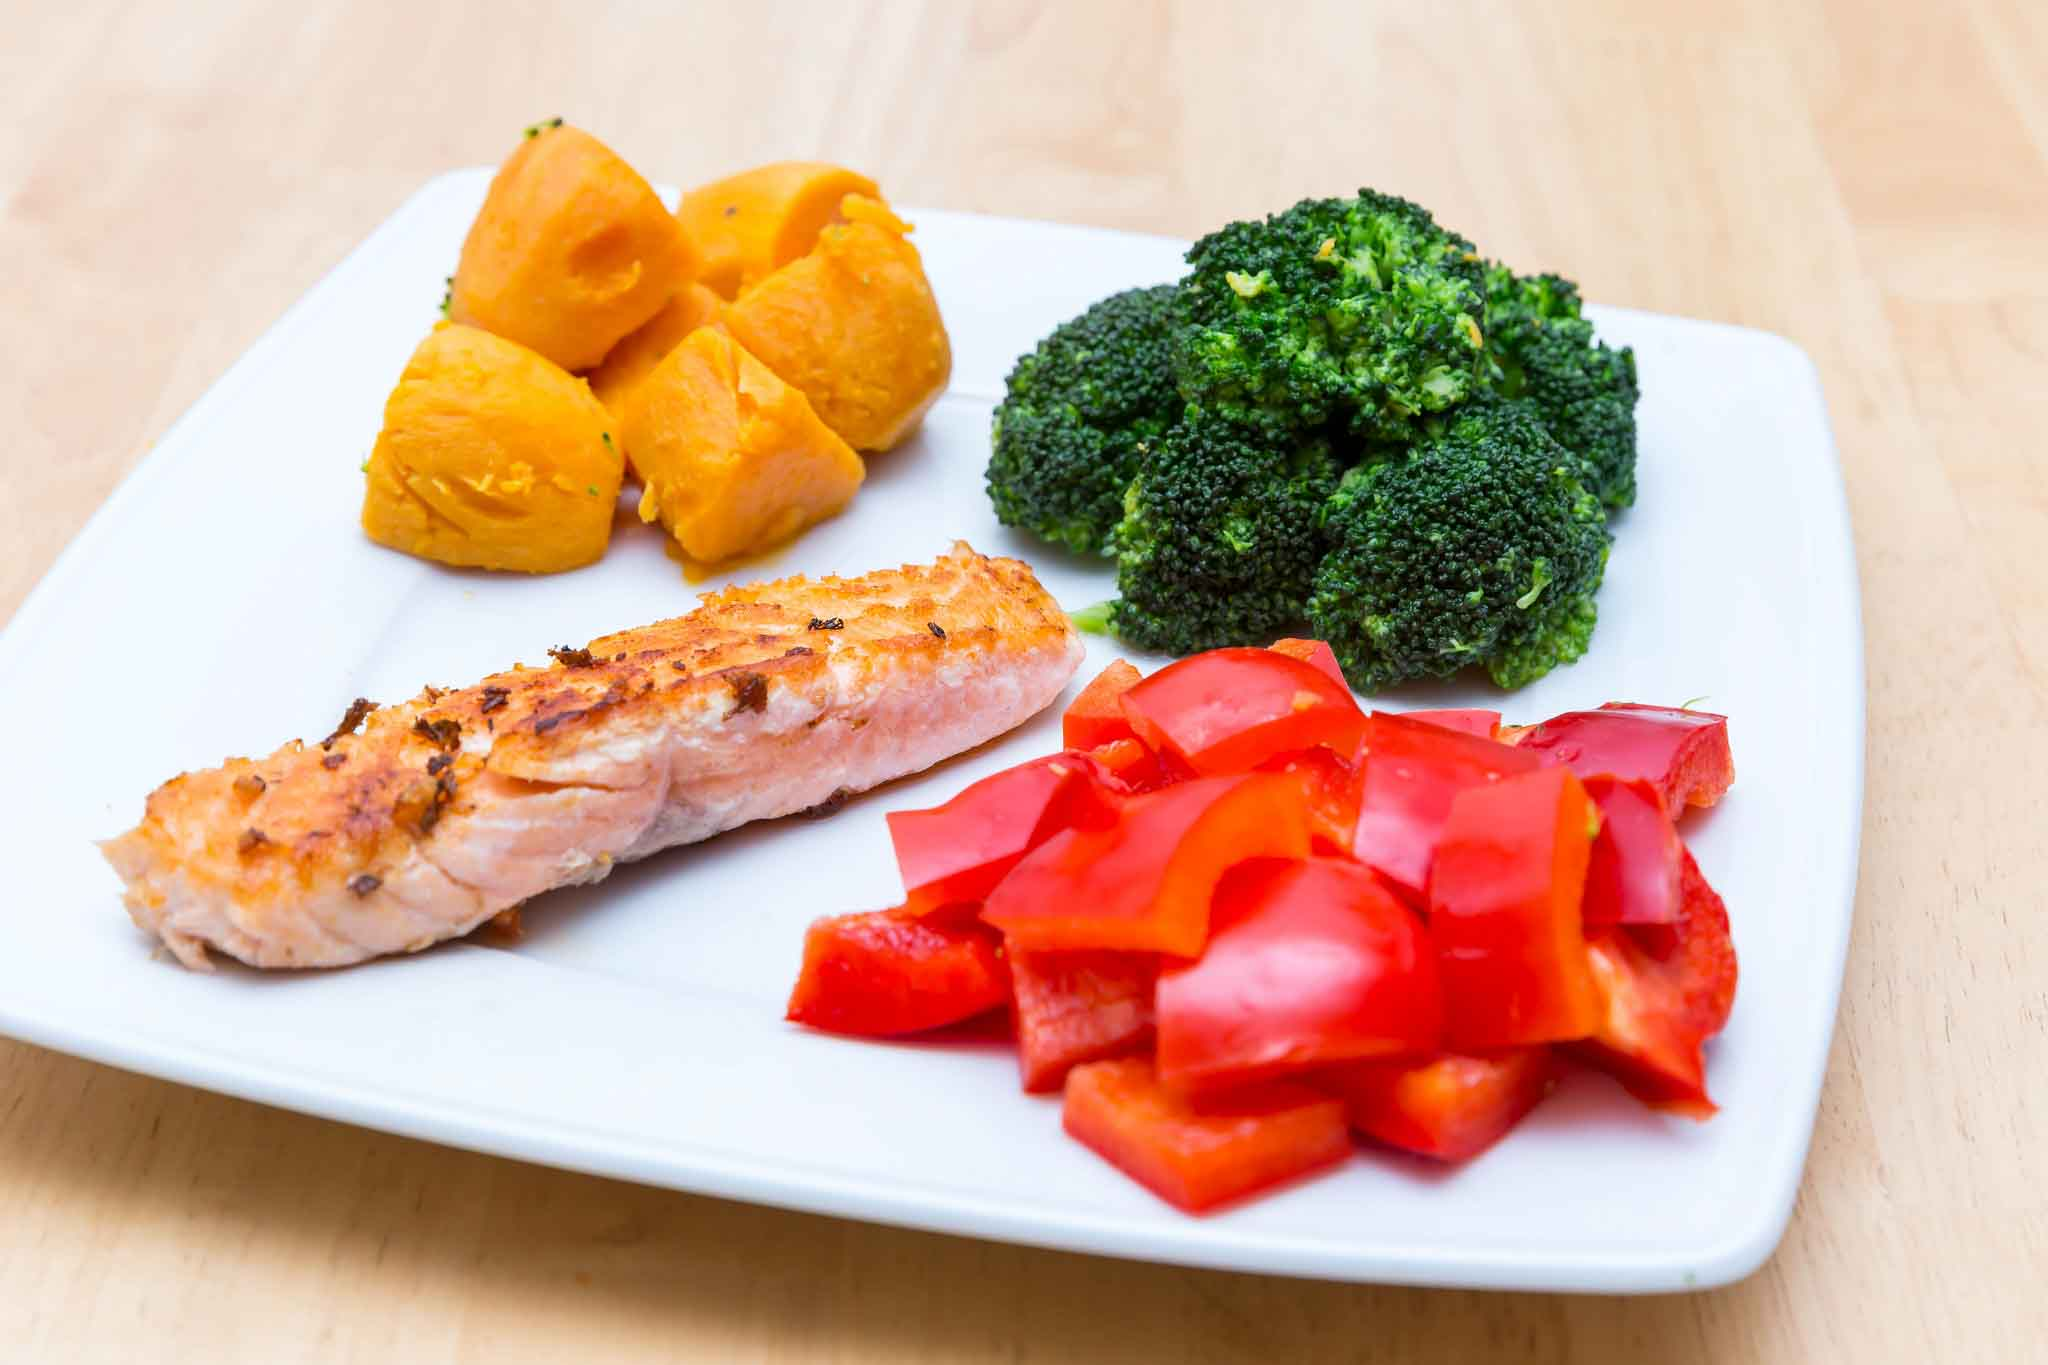 Plato con comida sana